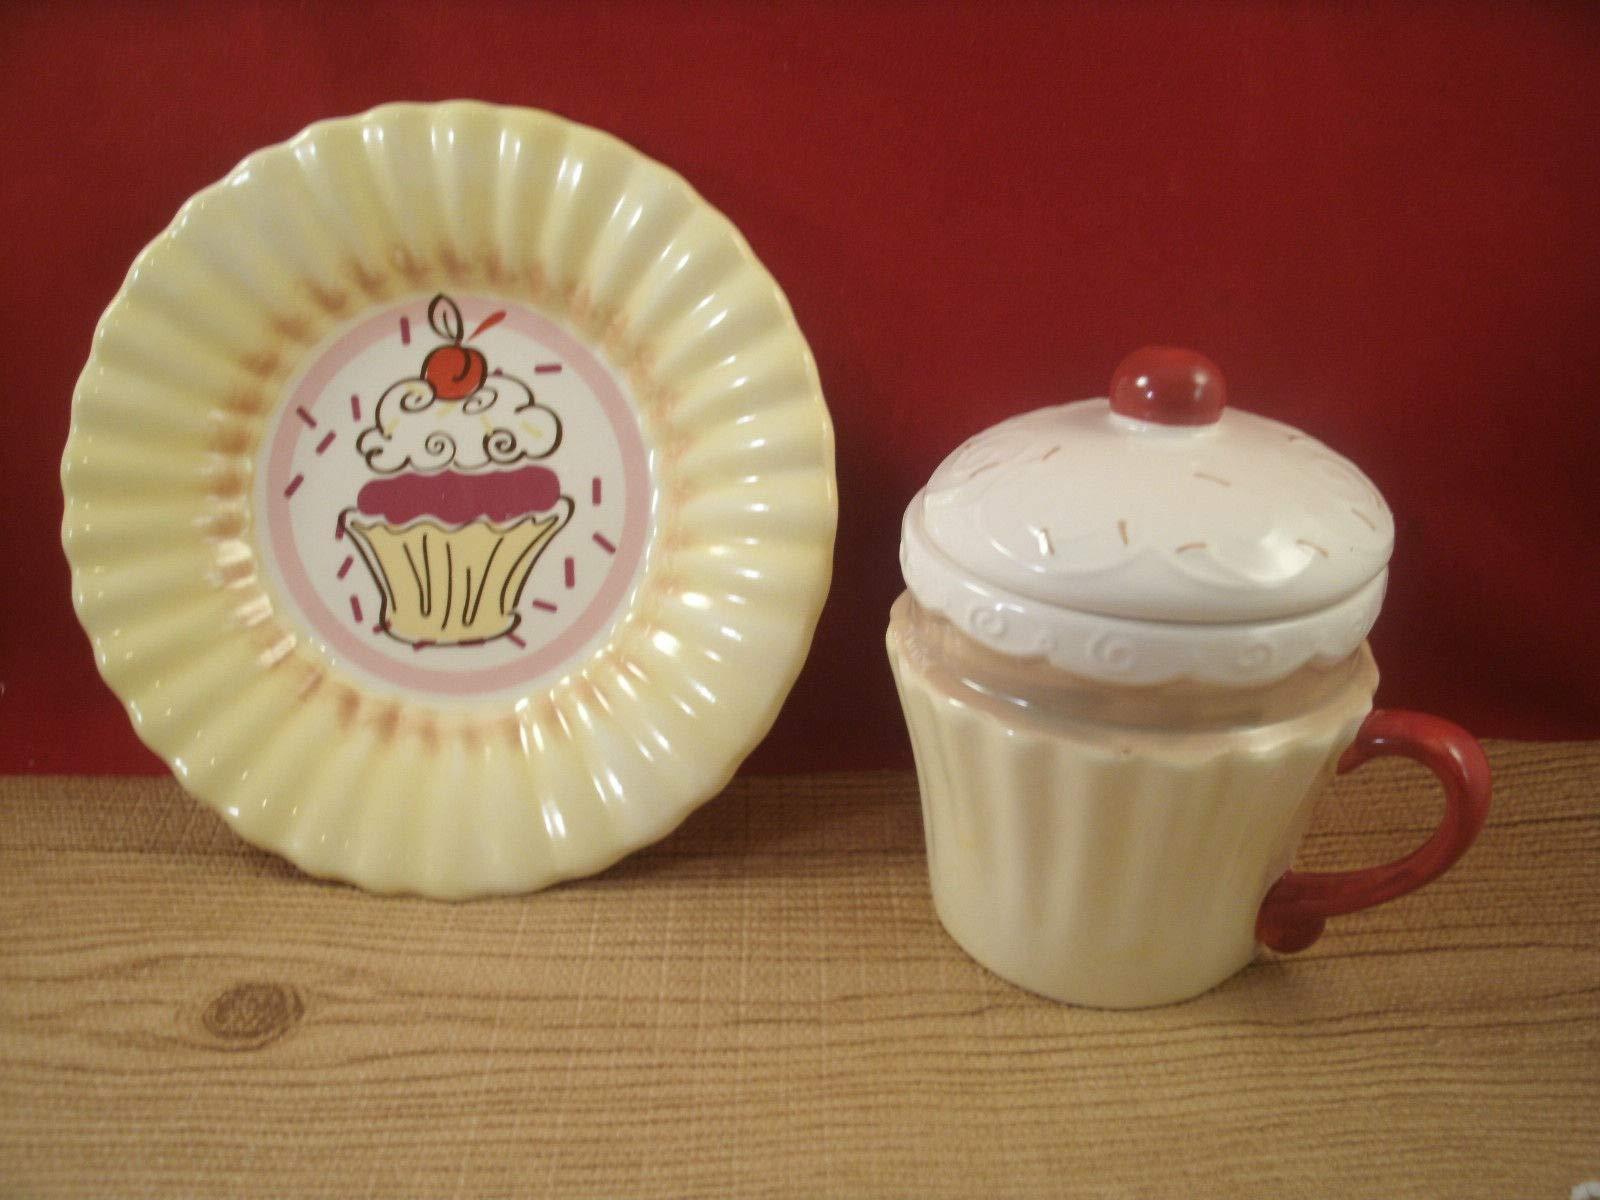 Tuweep New Ceramic Cupcake Mug Coffee Cup Saucer Plate Yellow RED TAN White 12oz by Tuweep